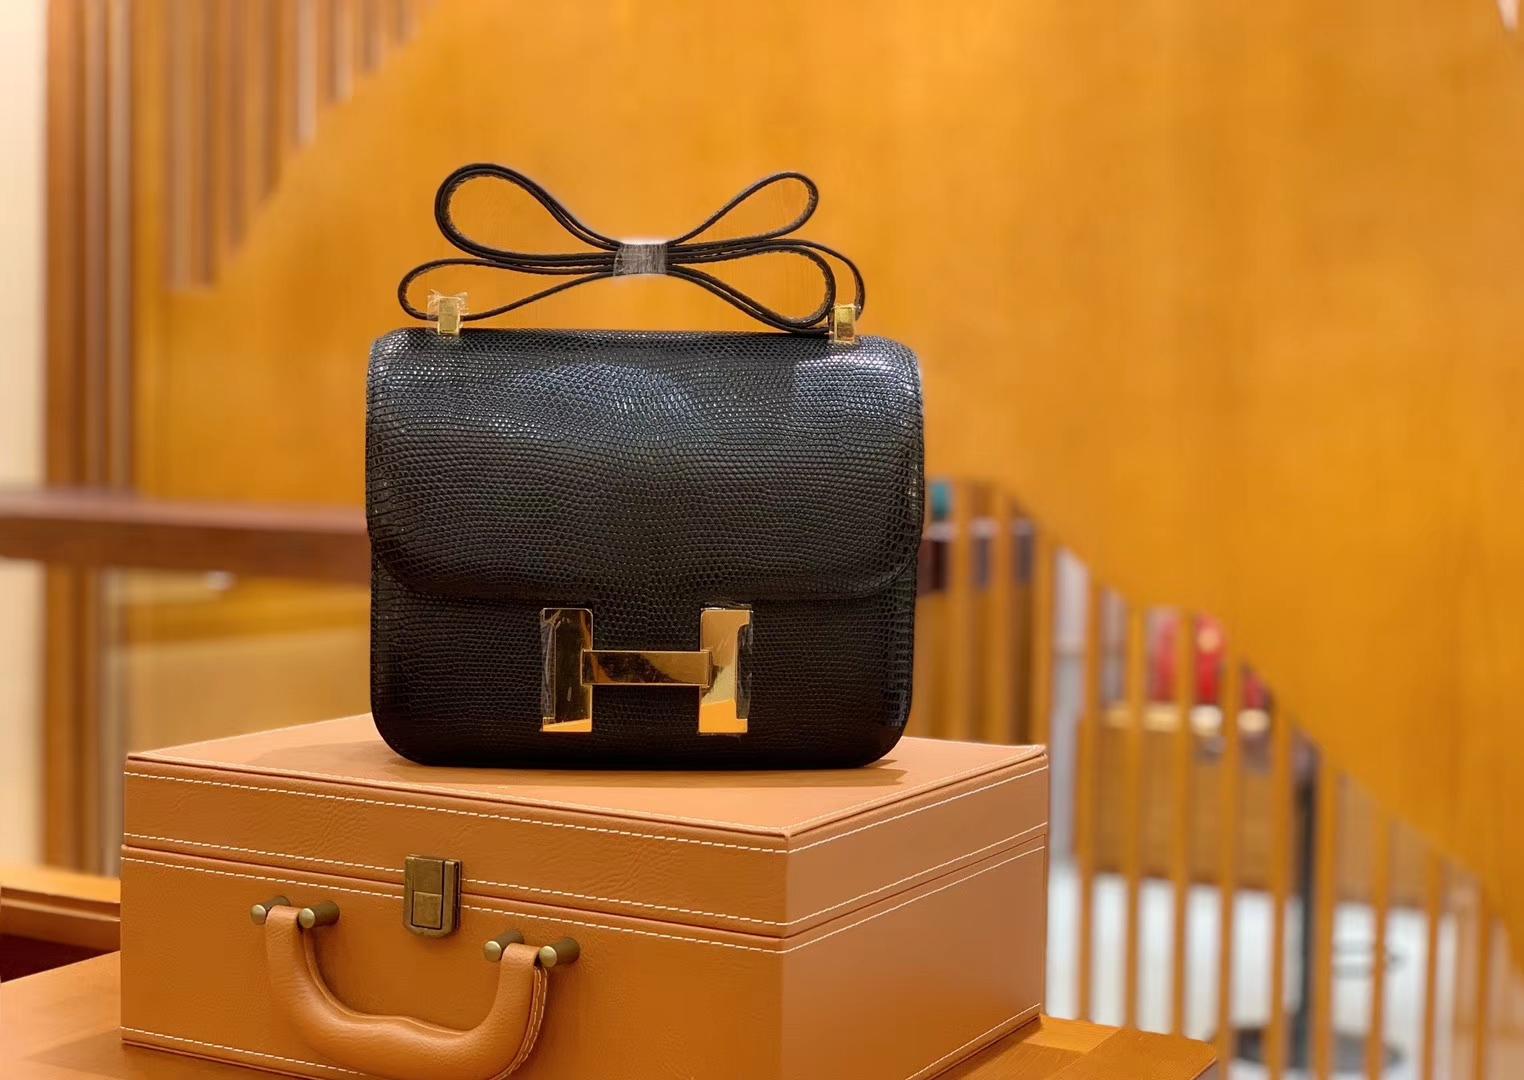 Hermès(爱马仕)Constance 空姐包 经典黑 野生蜥蜴皮 全手工缝制 23cm 金扣 现货